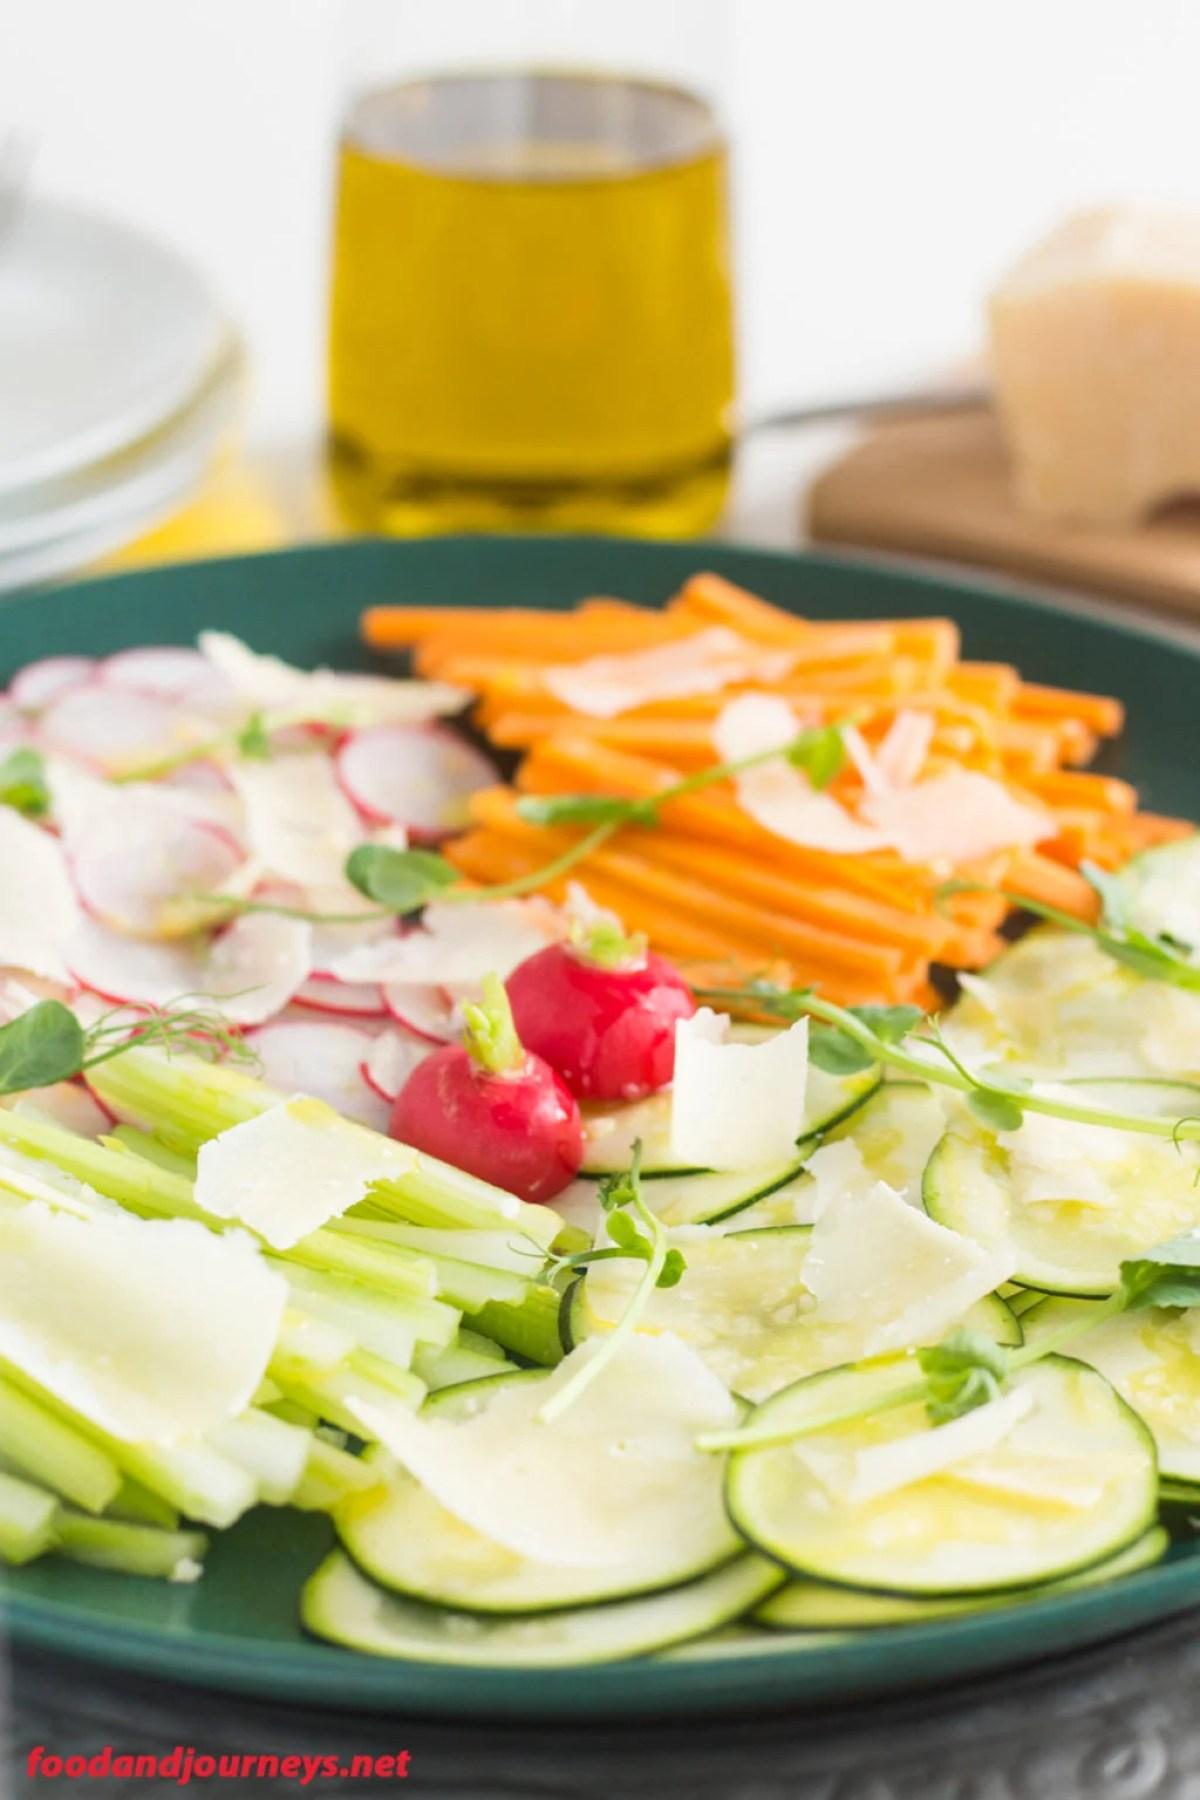 Vegetable Carpaccio with Parmesan Shavings pic1|foodandjourneys.net